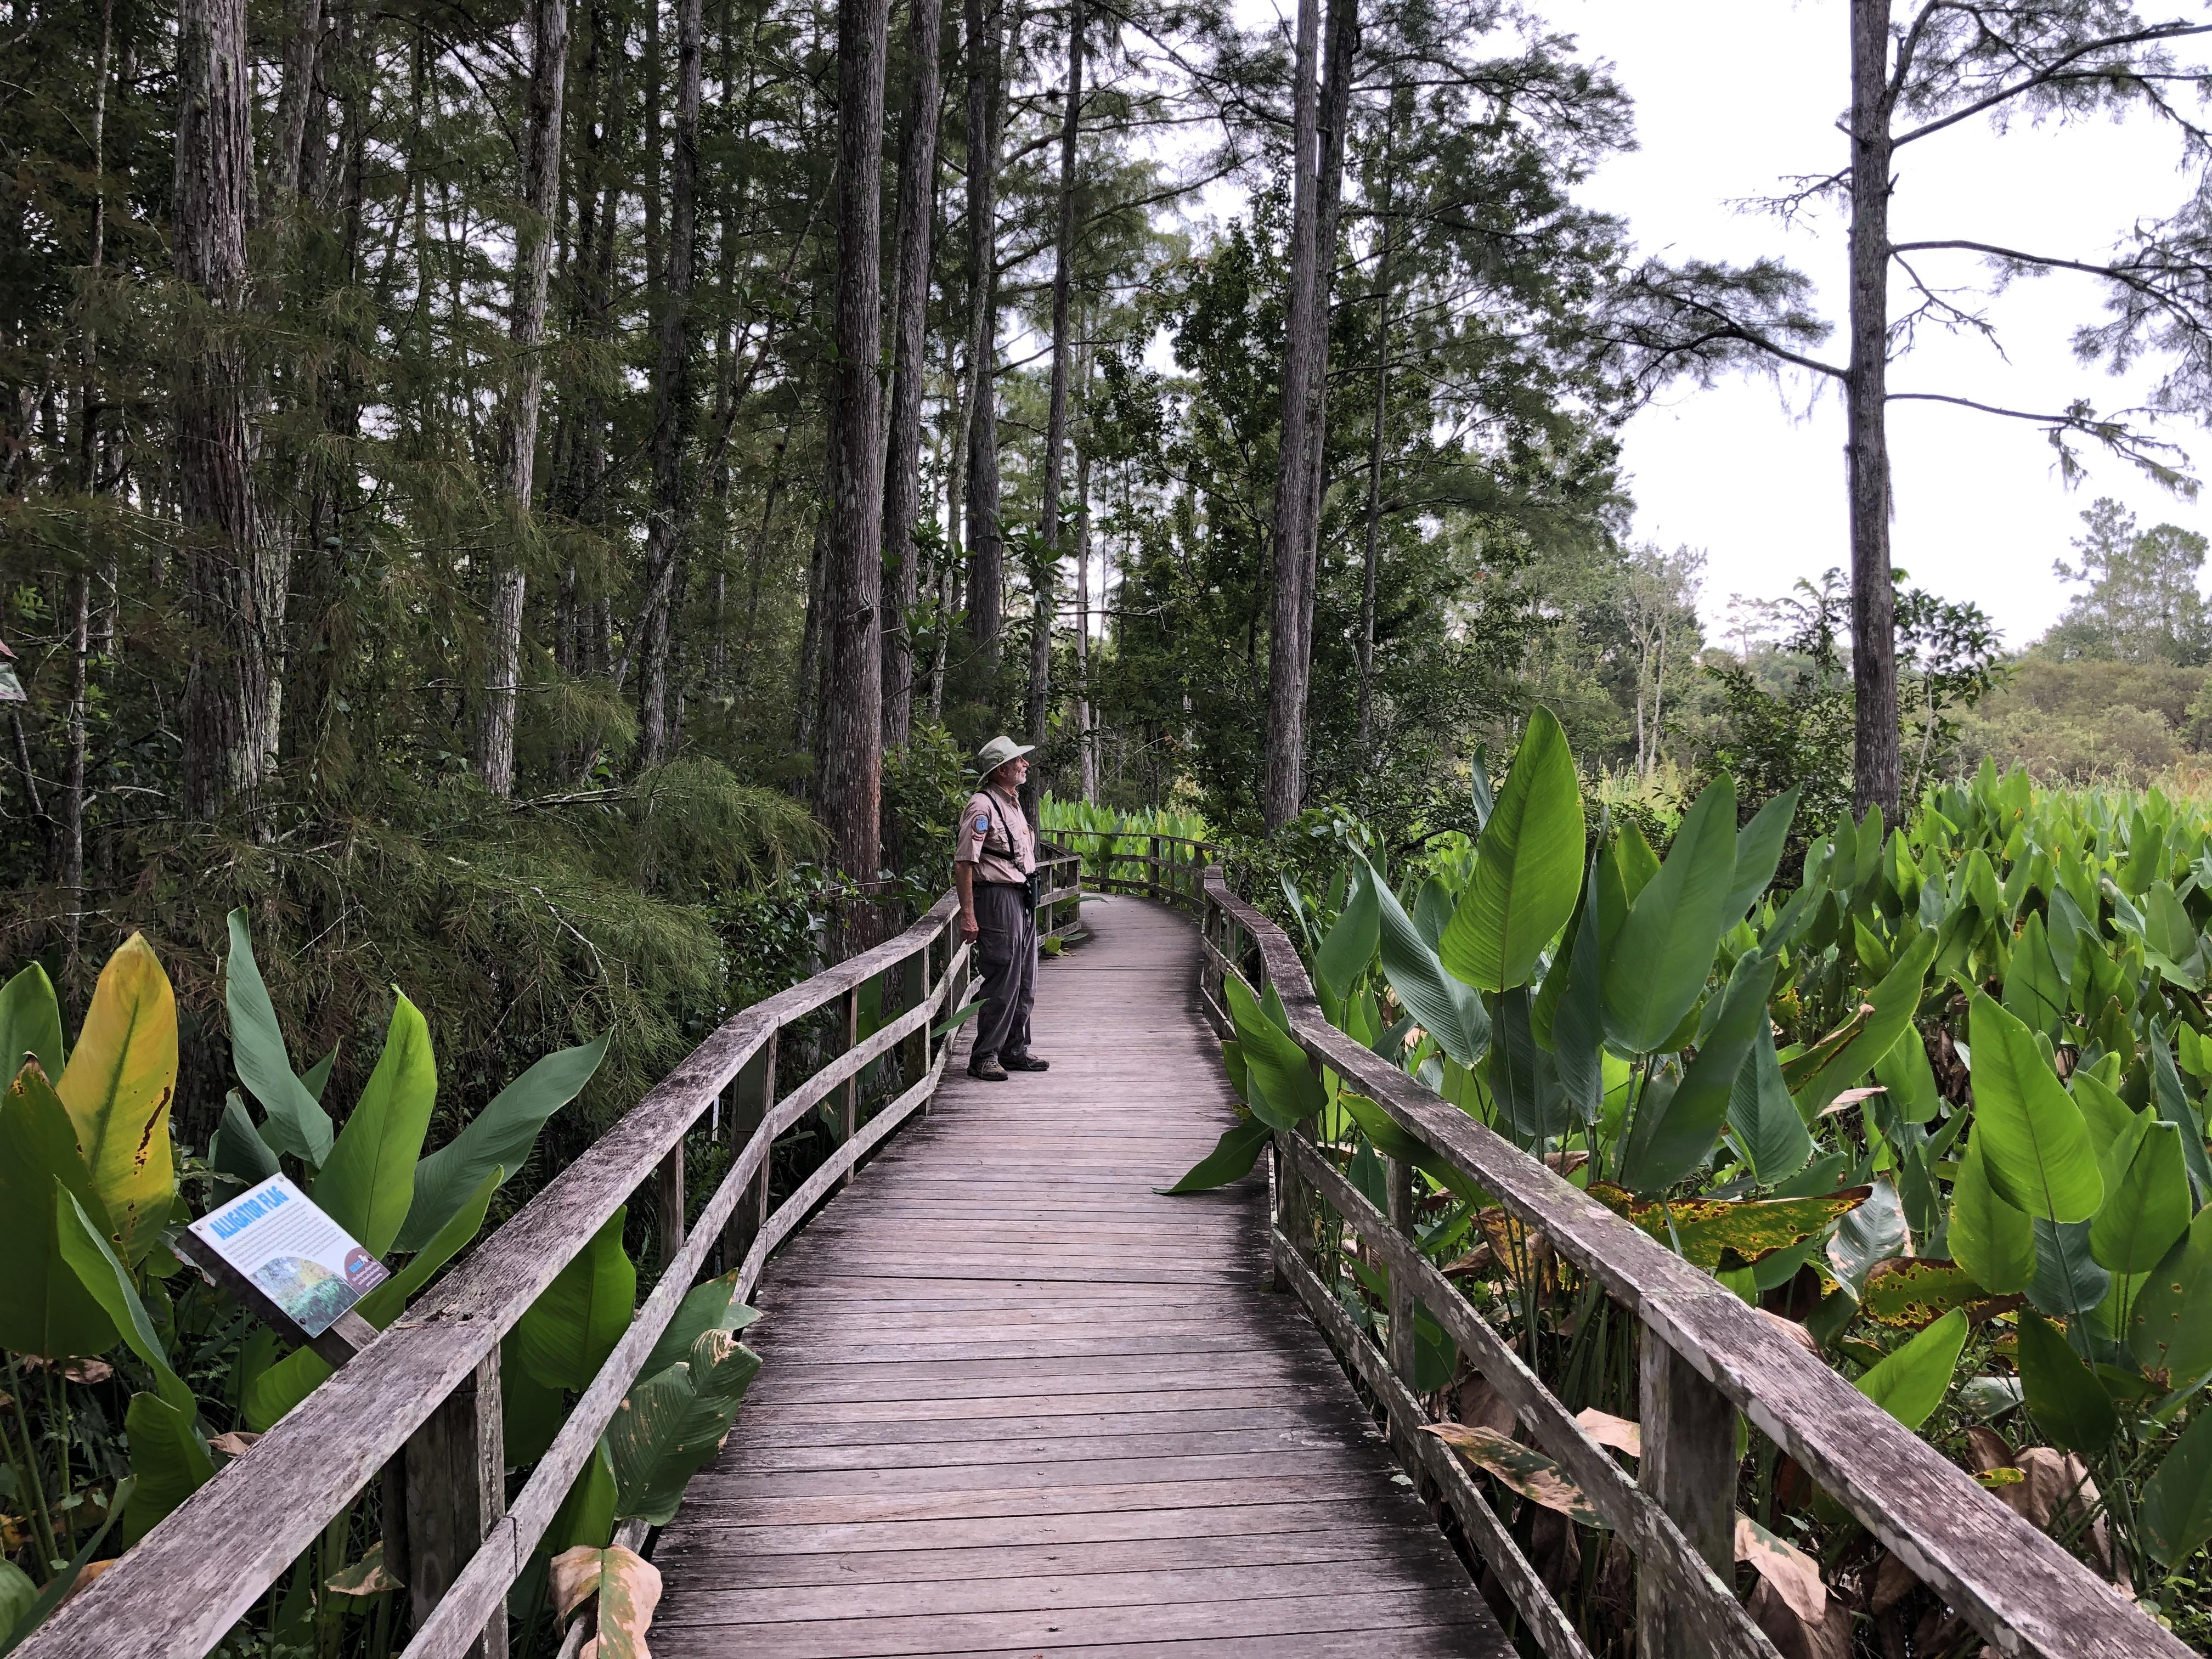 Volunteer naturalist on the boardwalk.